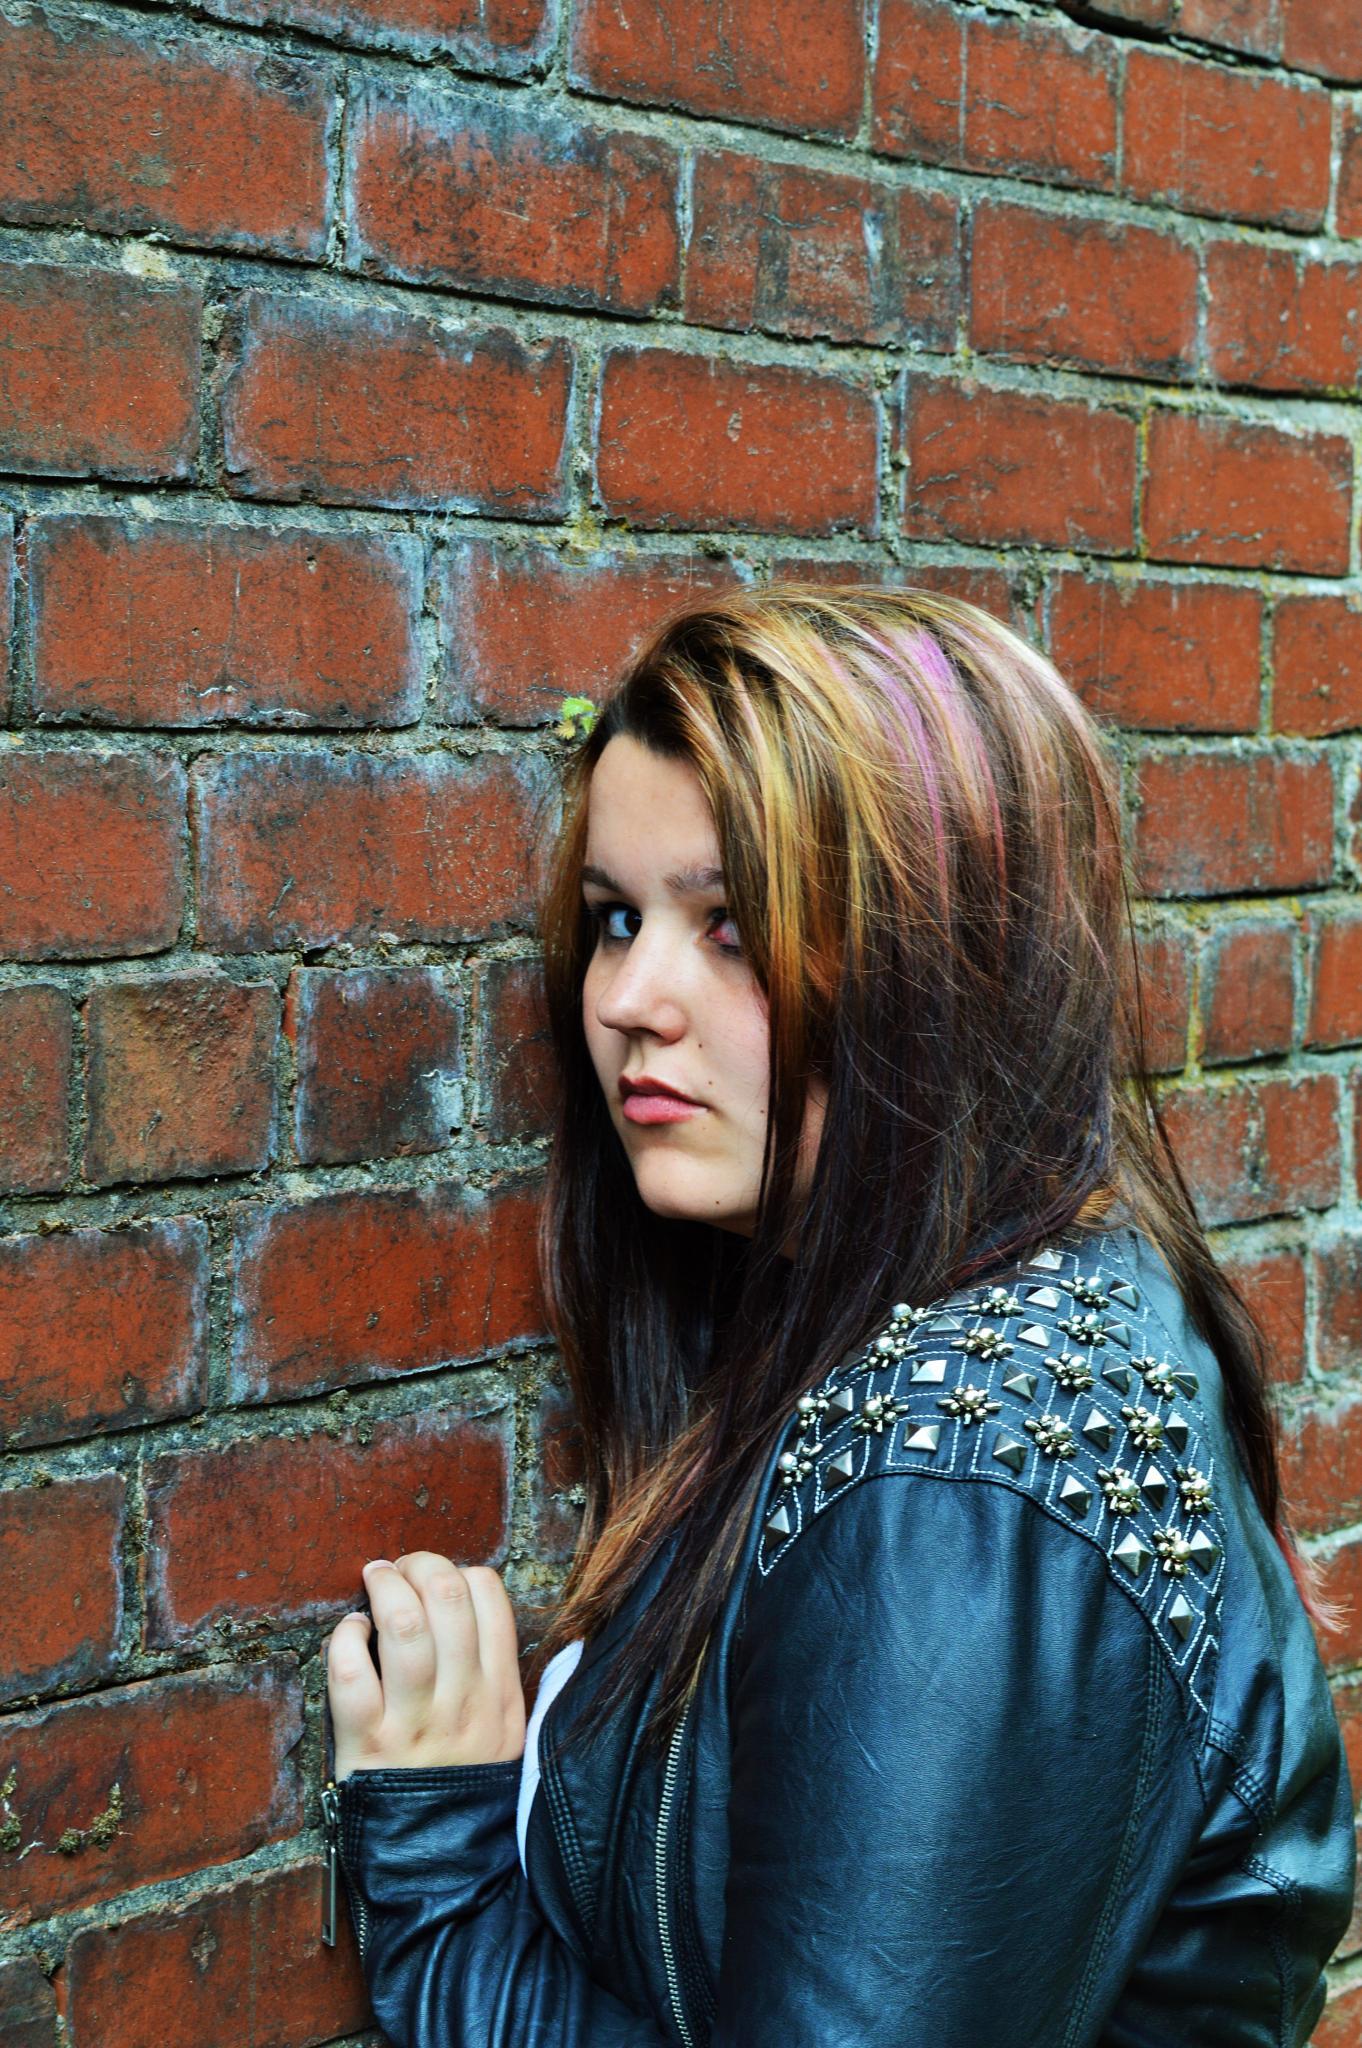 Red Brick Portrait by Danielle Byatte